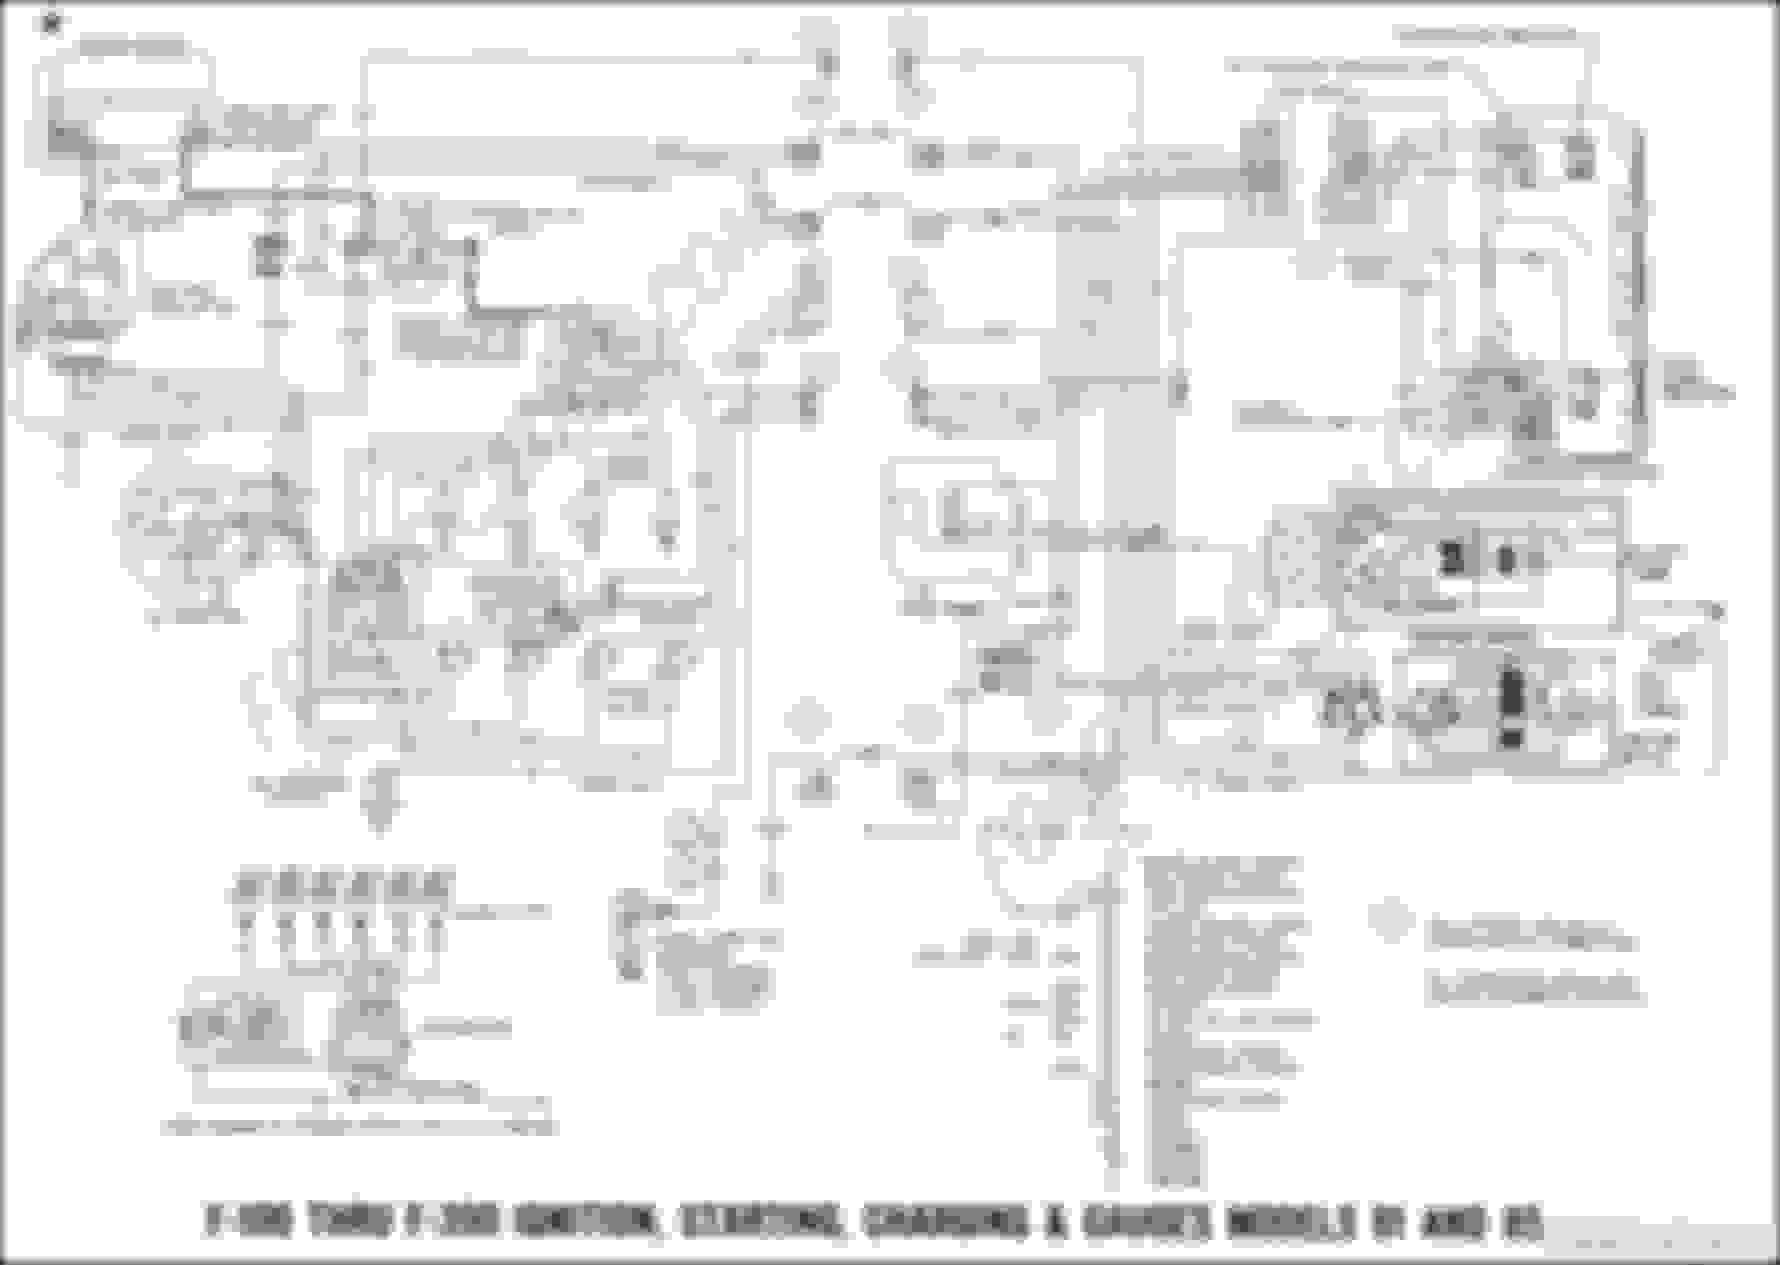 1970 F250 Wiring Diagram - Wiring Diagram K7 Factory Wiring Diagram Ford Maverick on